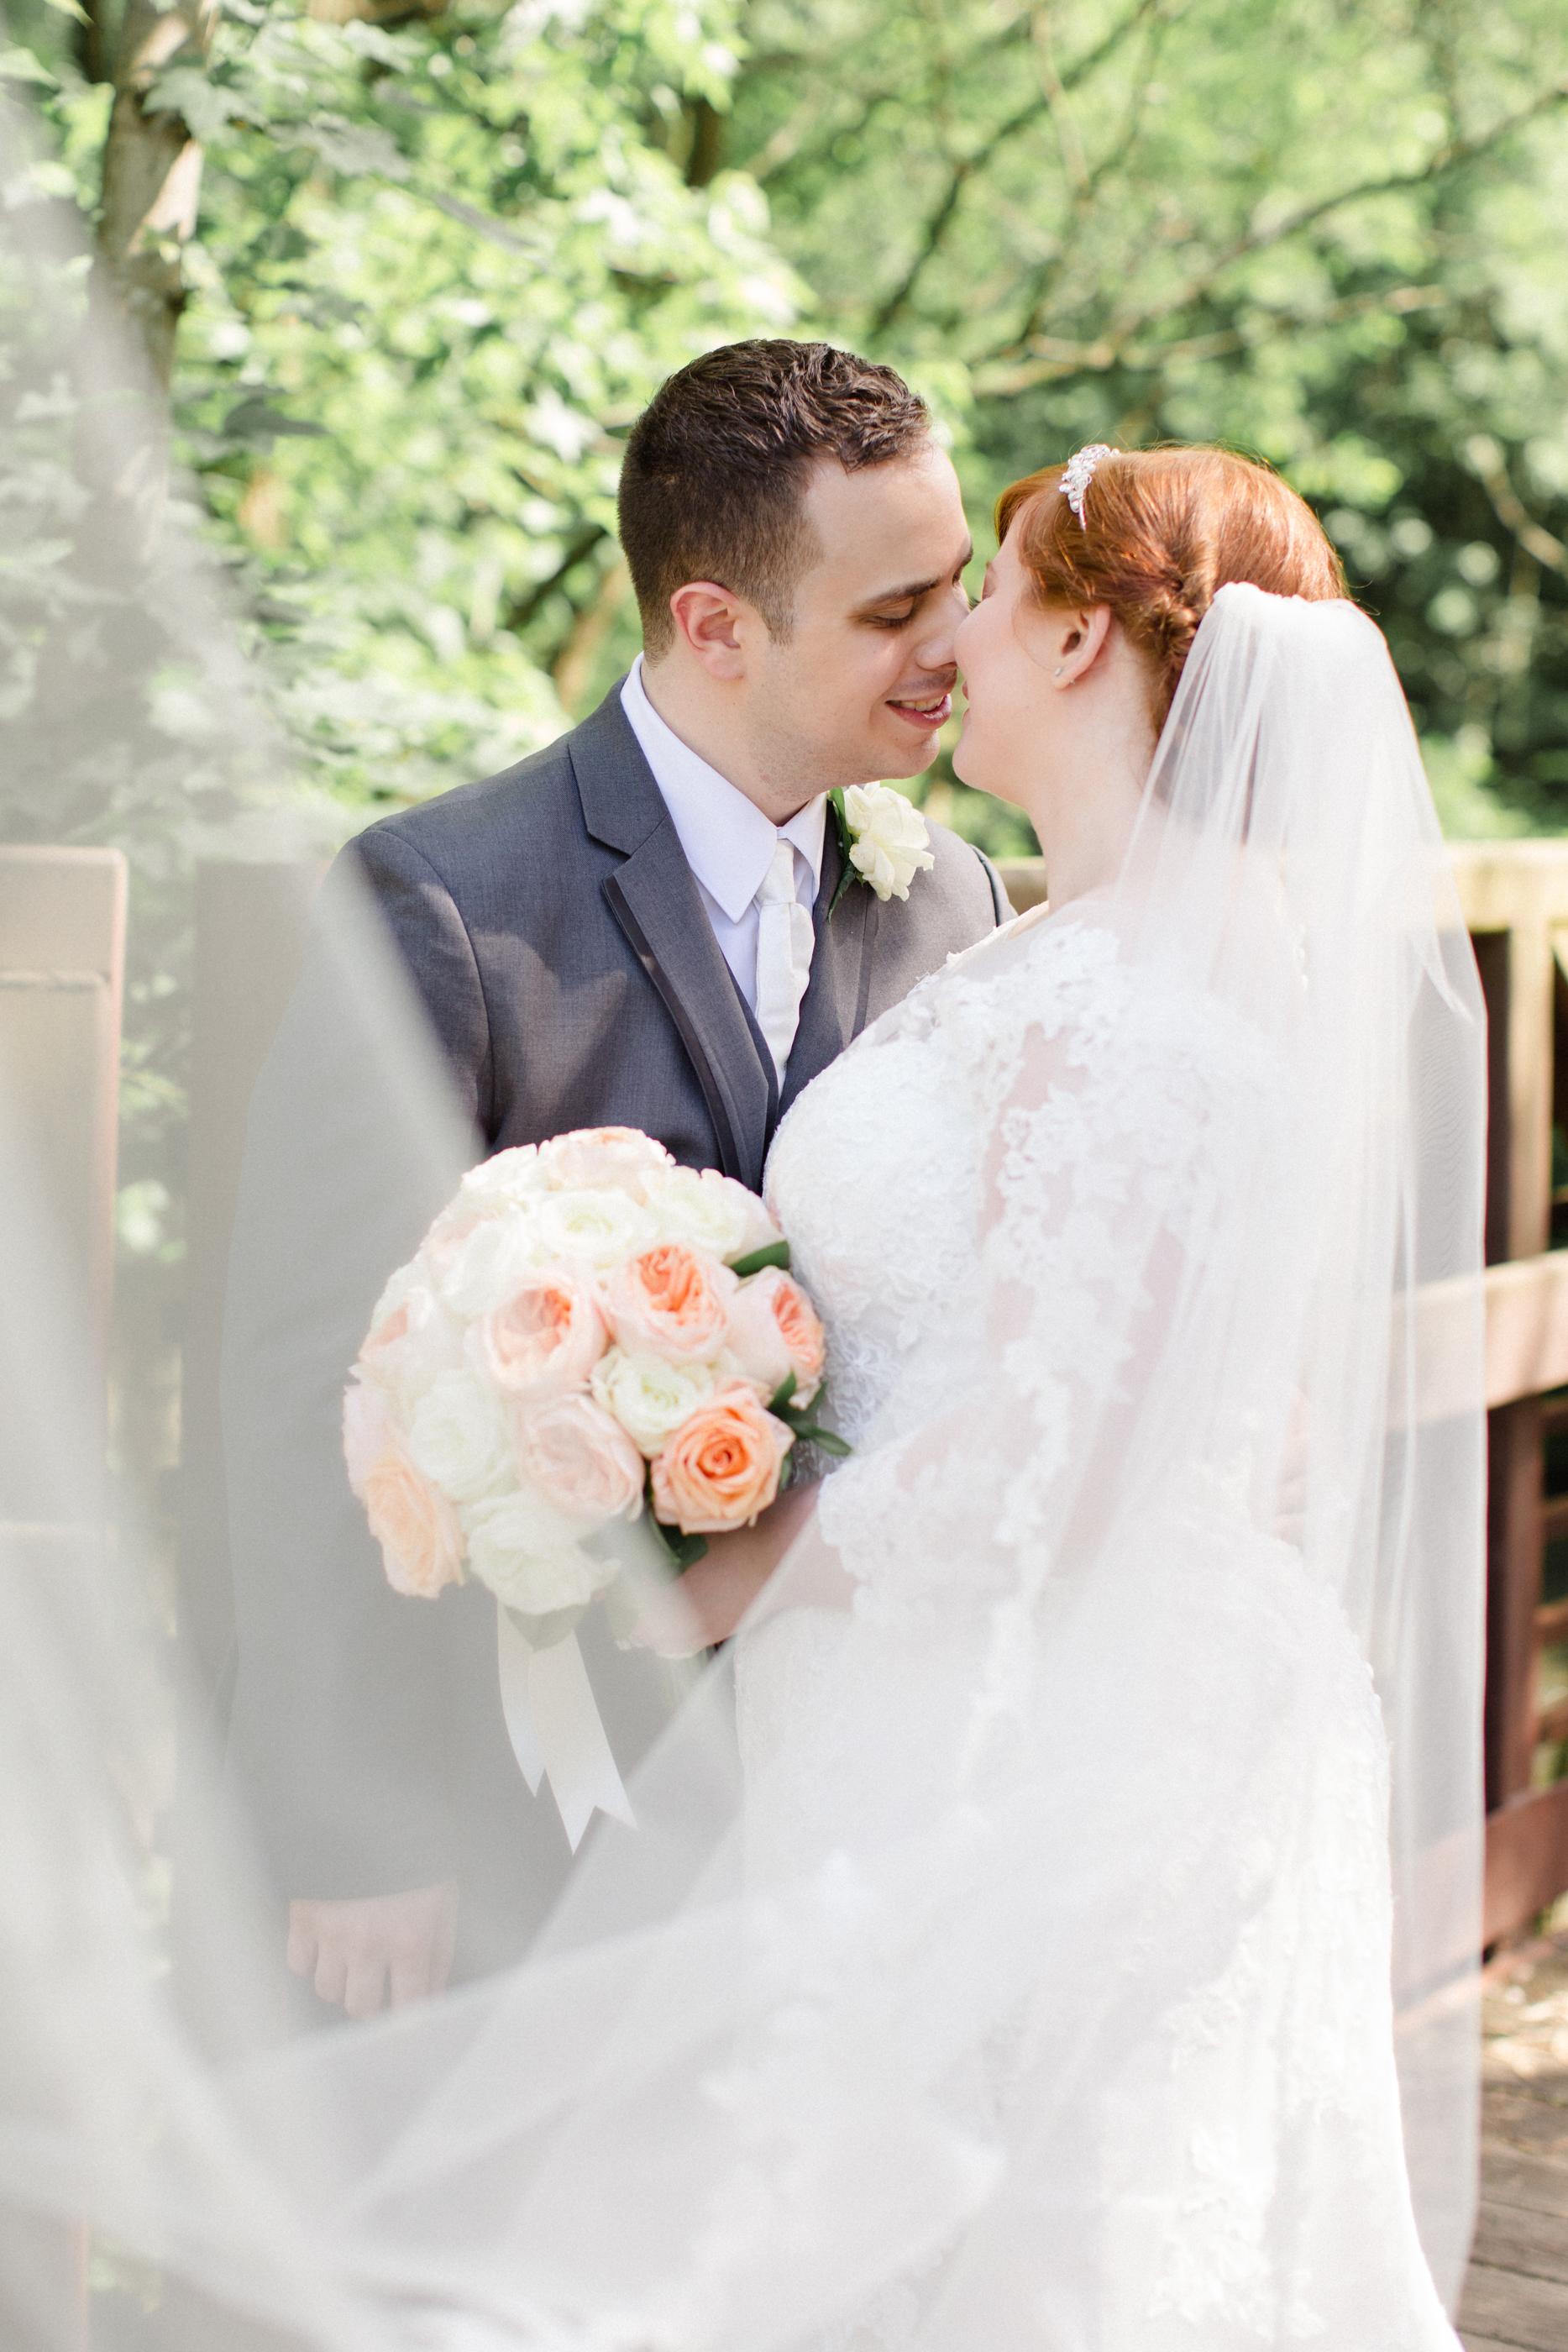 Fiorellis Wedding Photos_JDP-93.jpg